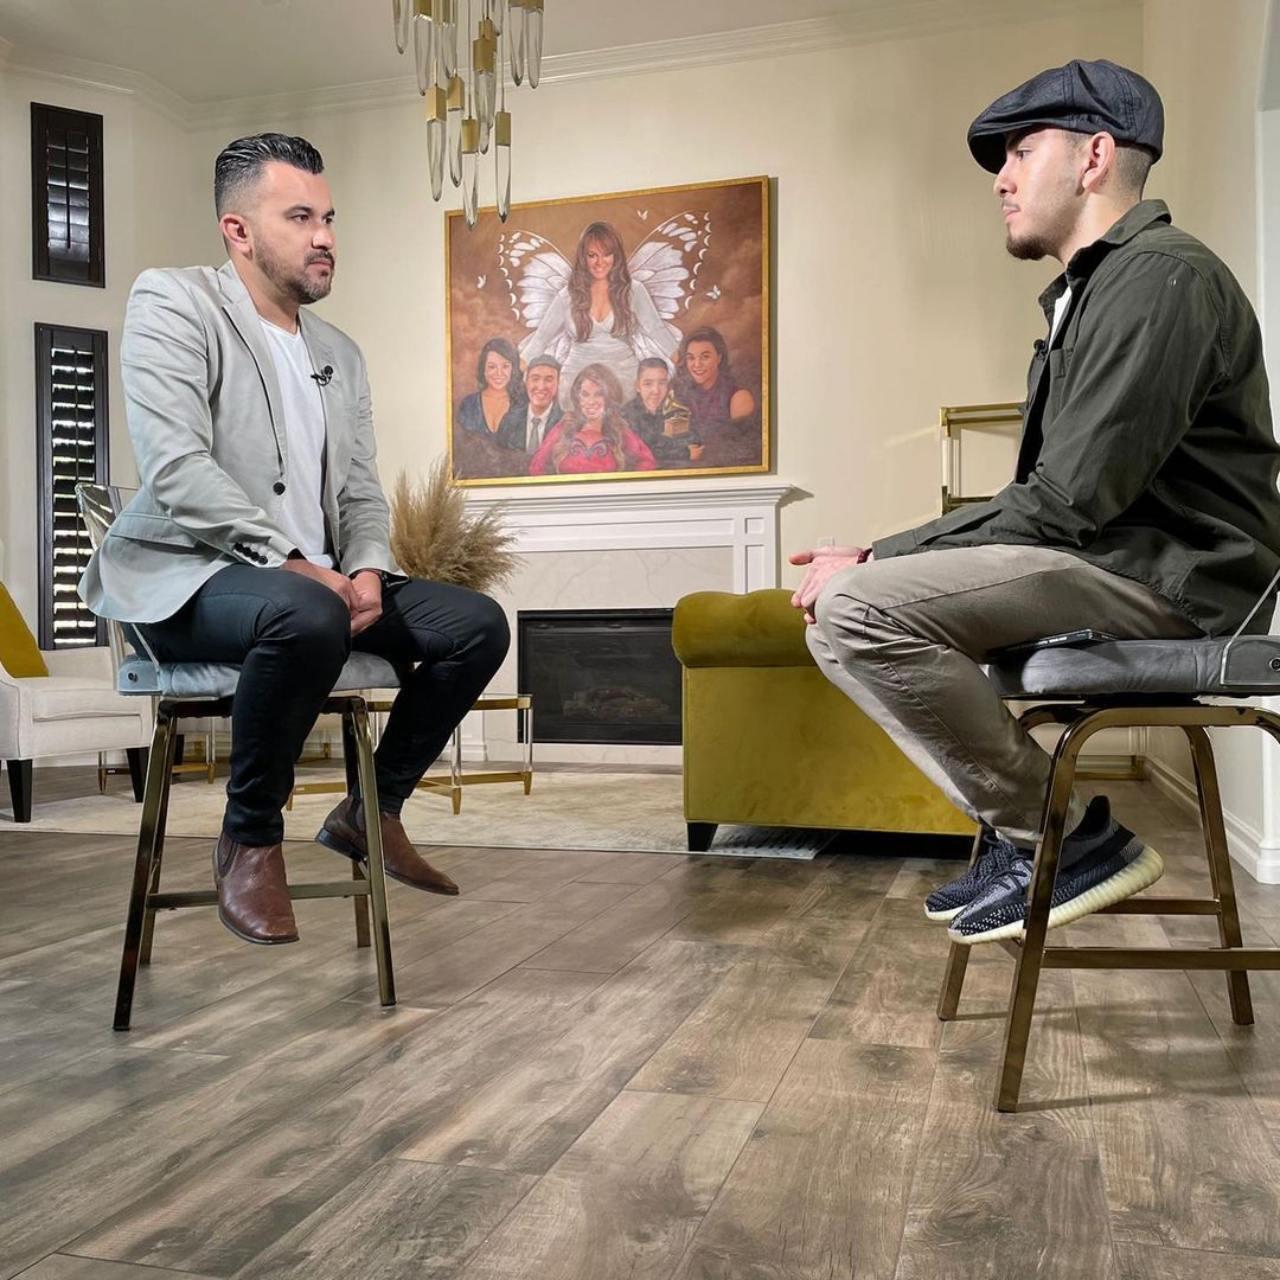 Hijo de Jenni Rivera en entrevista